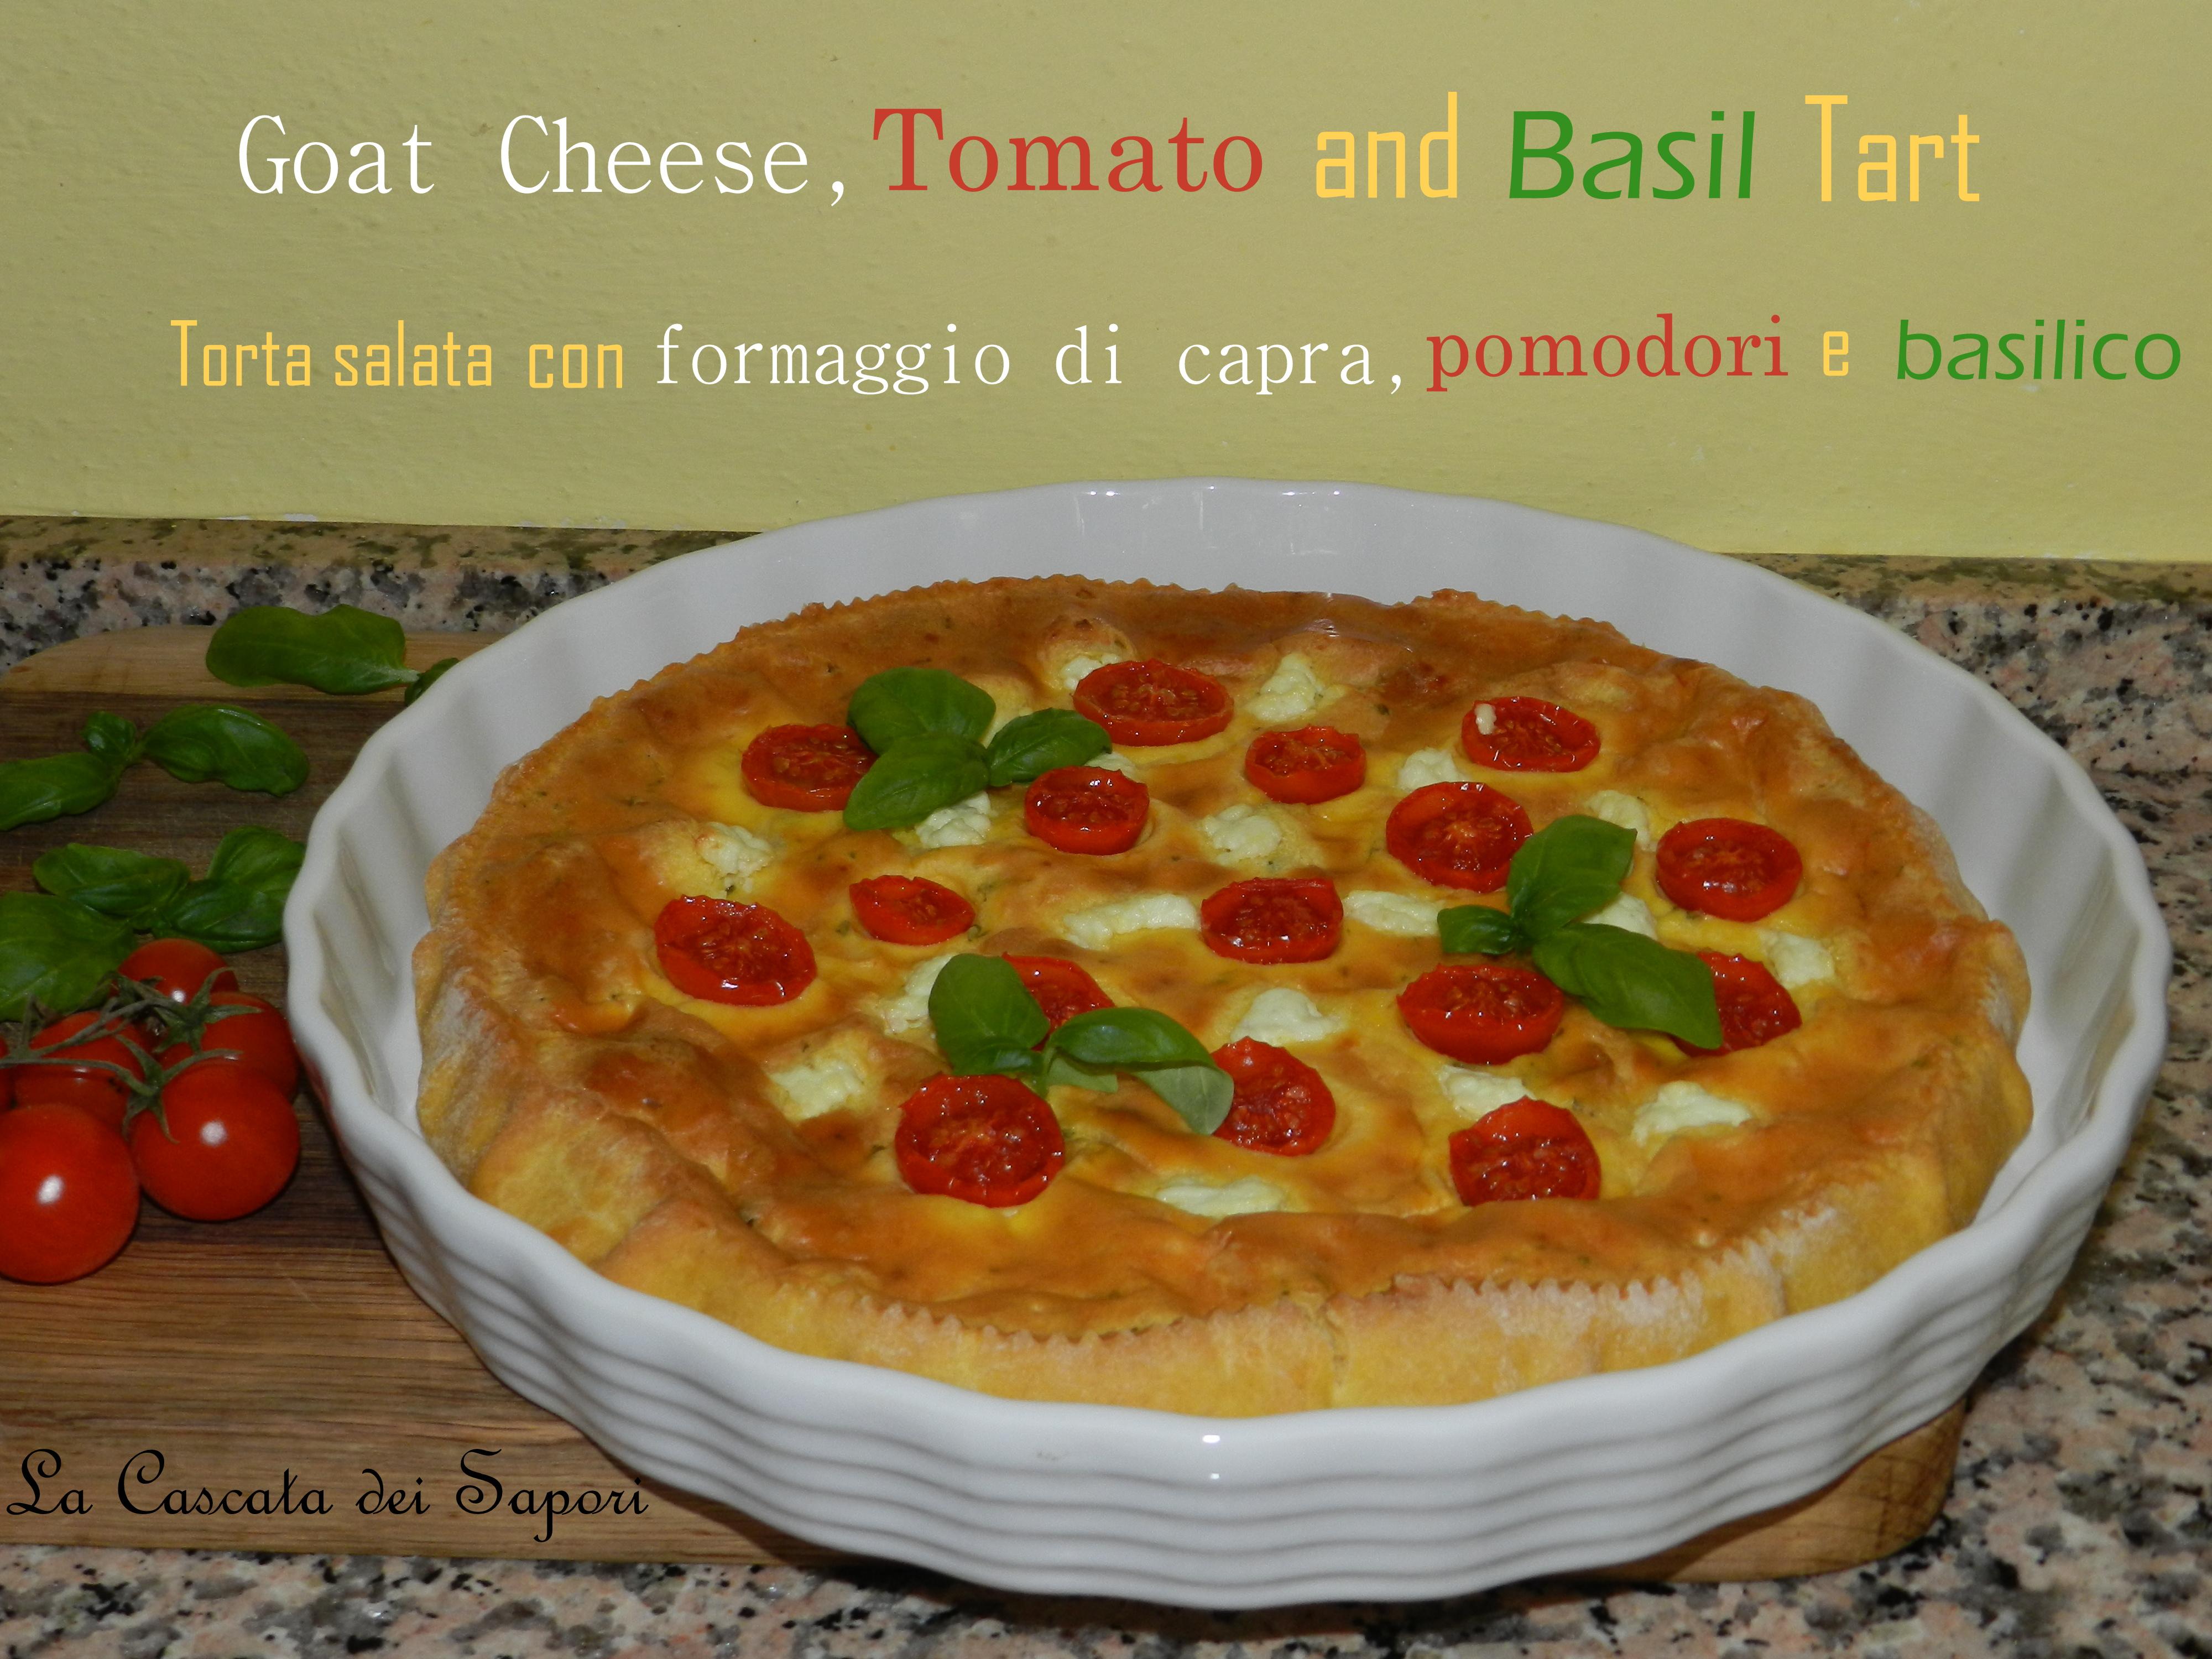 Goat Cheese, Tomato and Basil Tart – Torta salata con caprino pomodori e basilico